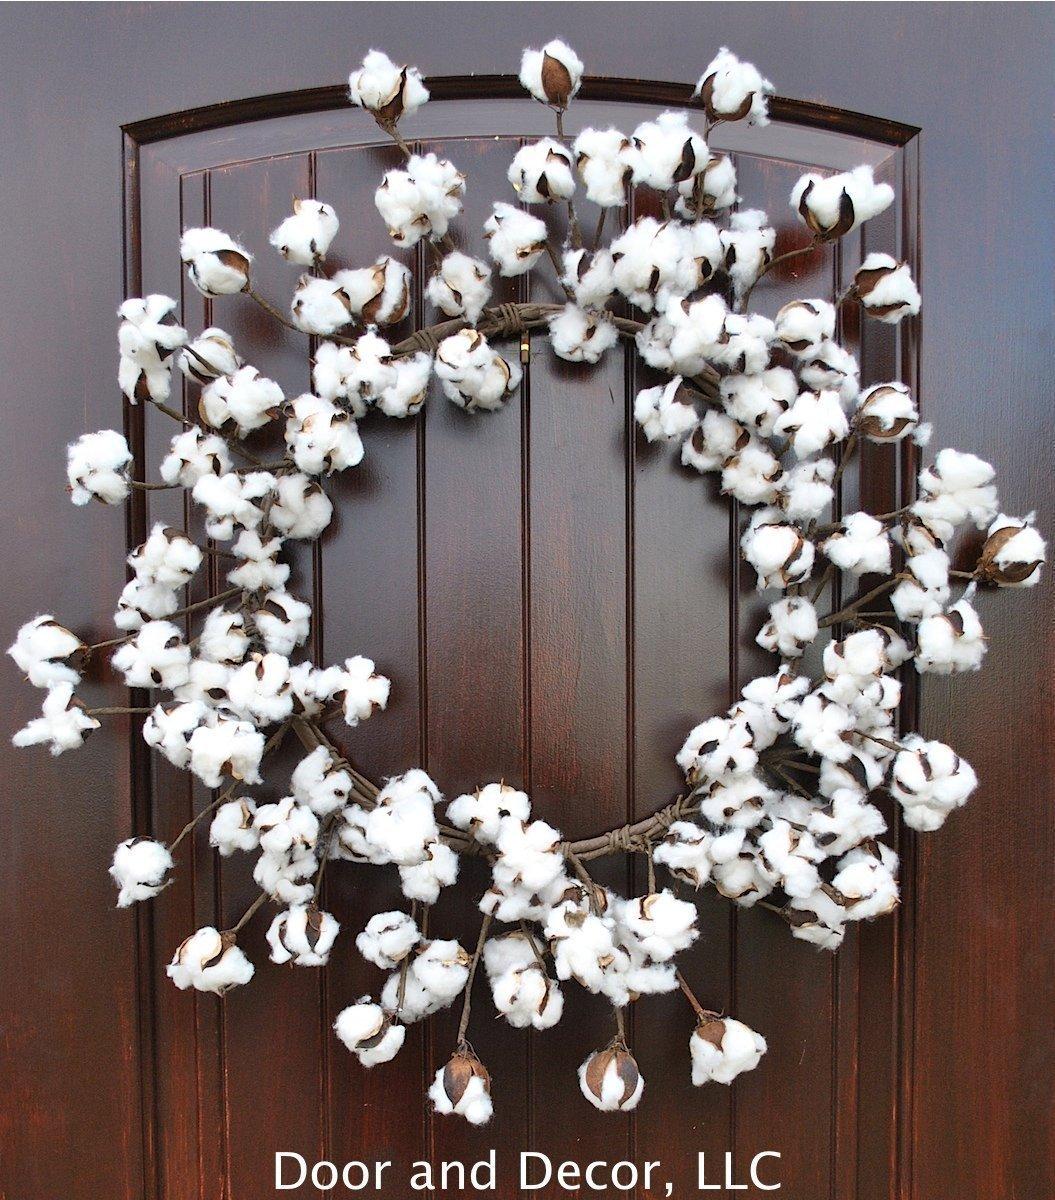 Amazon Com Cotton Wreath With Real Preserved Bolls On Flexible Stems 22 26 Dia 4 Deep Rustic Farmhouse Decor Handmade